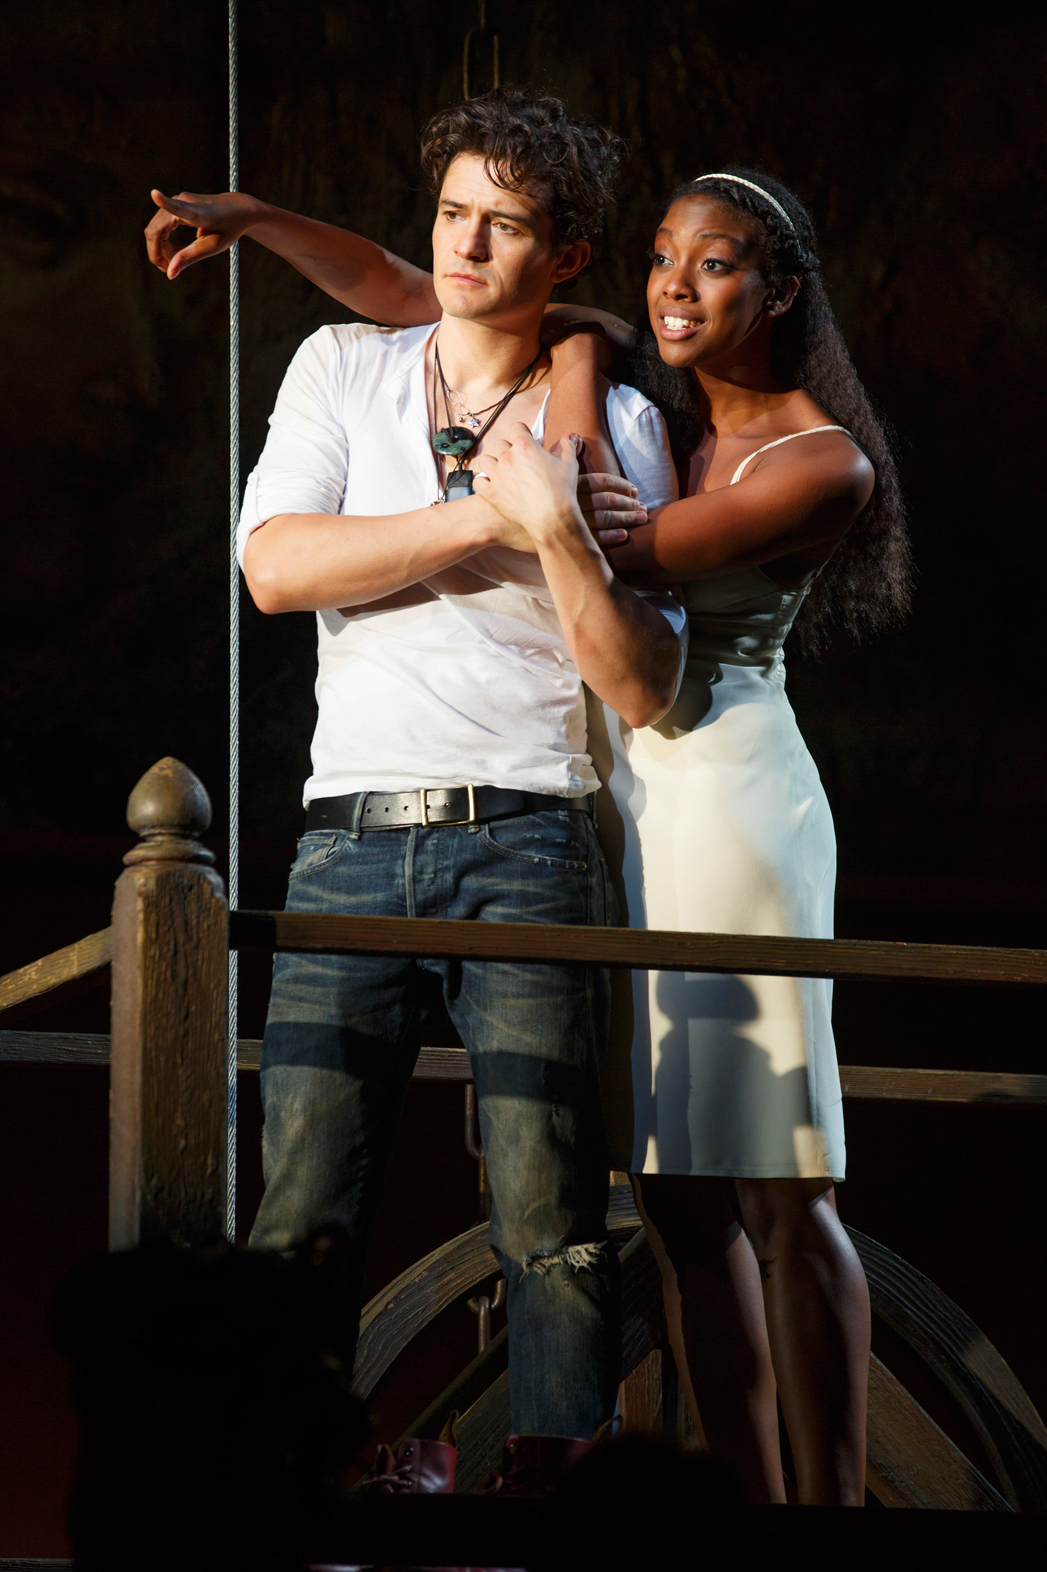 Romeo & Juliet Orlando Bloom Condola Rashad - P 2013